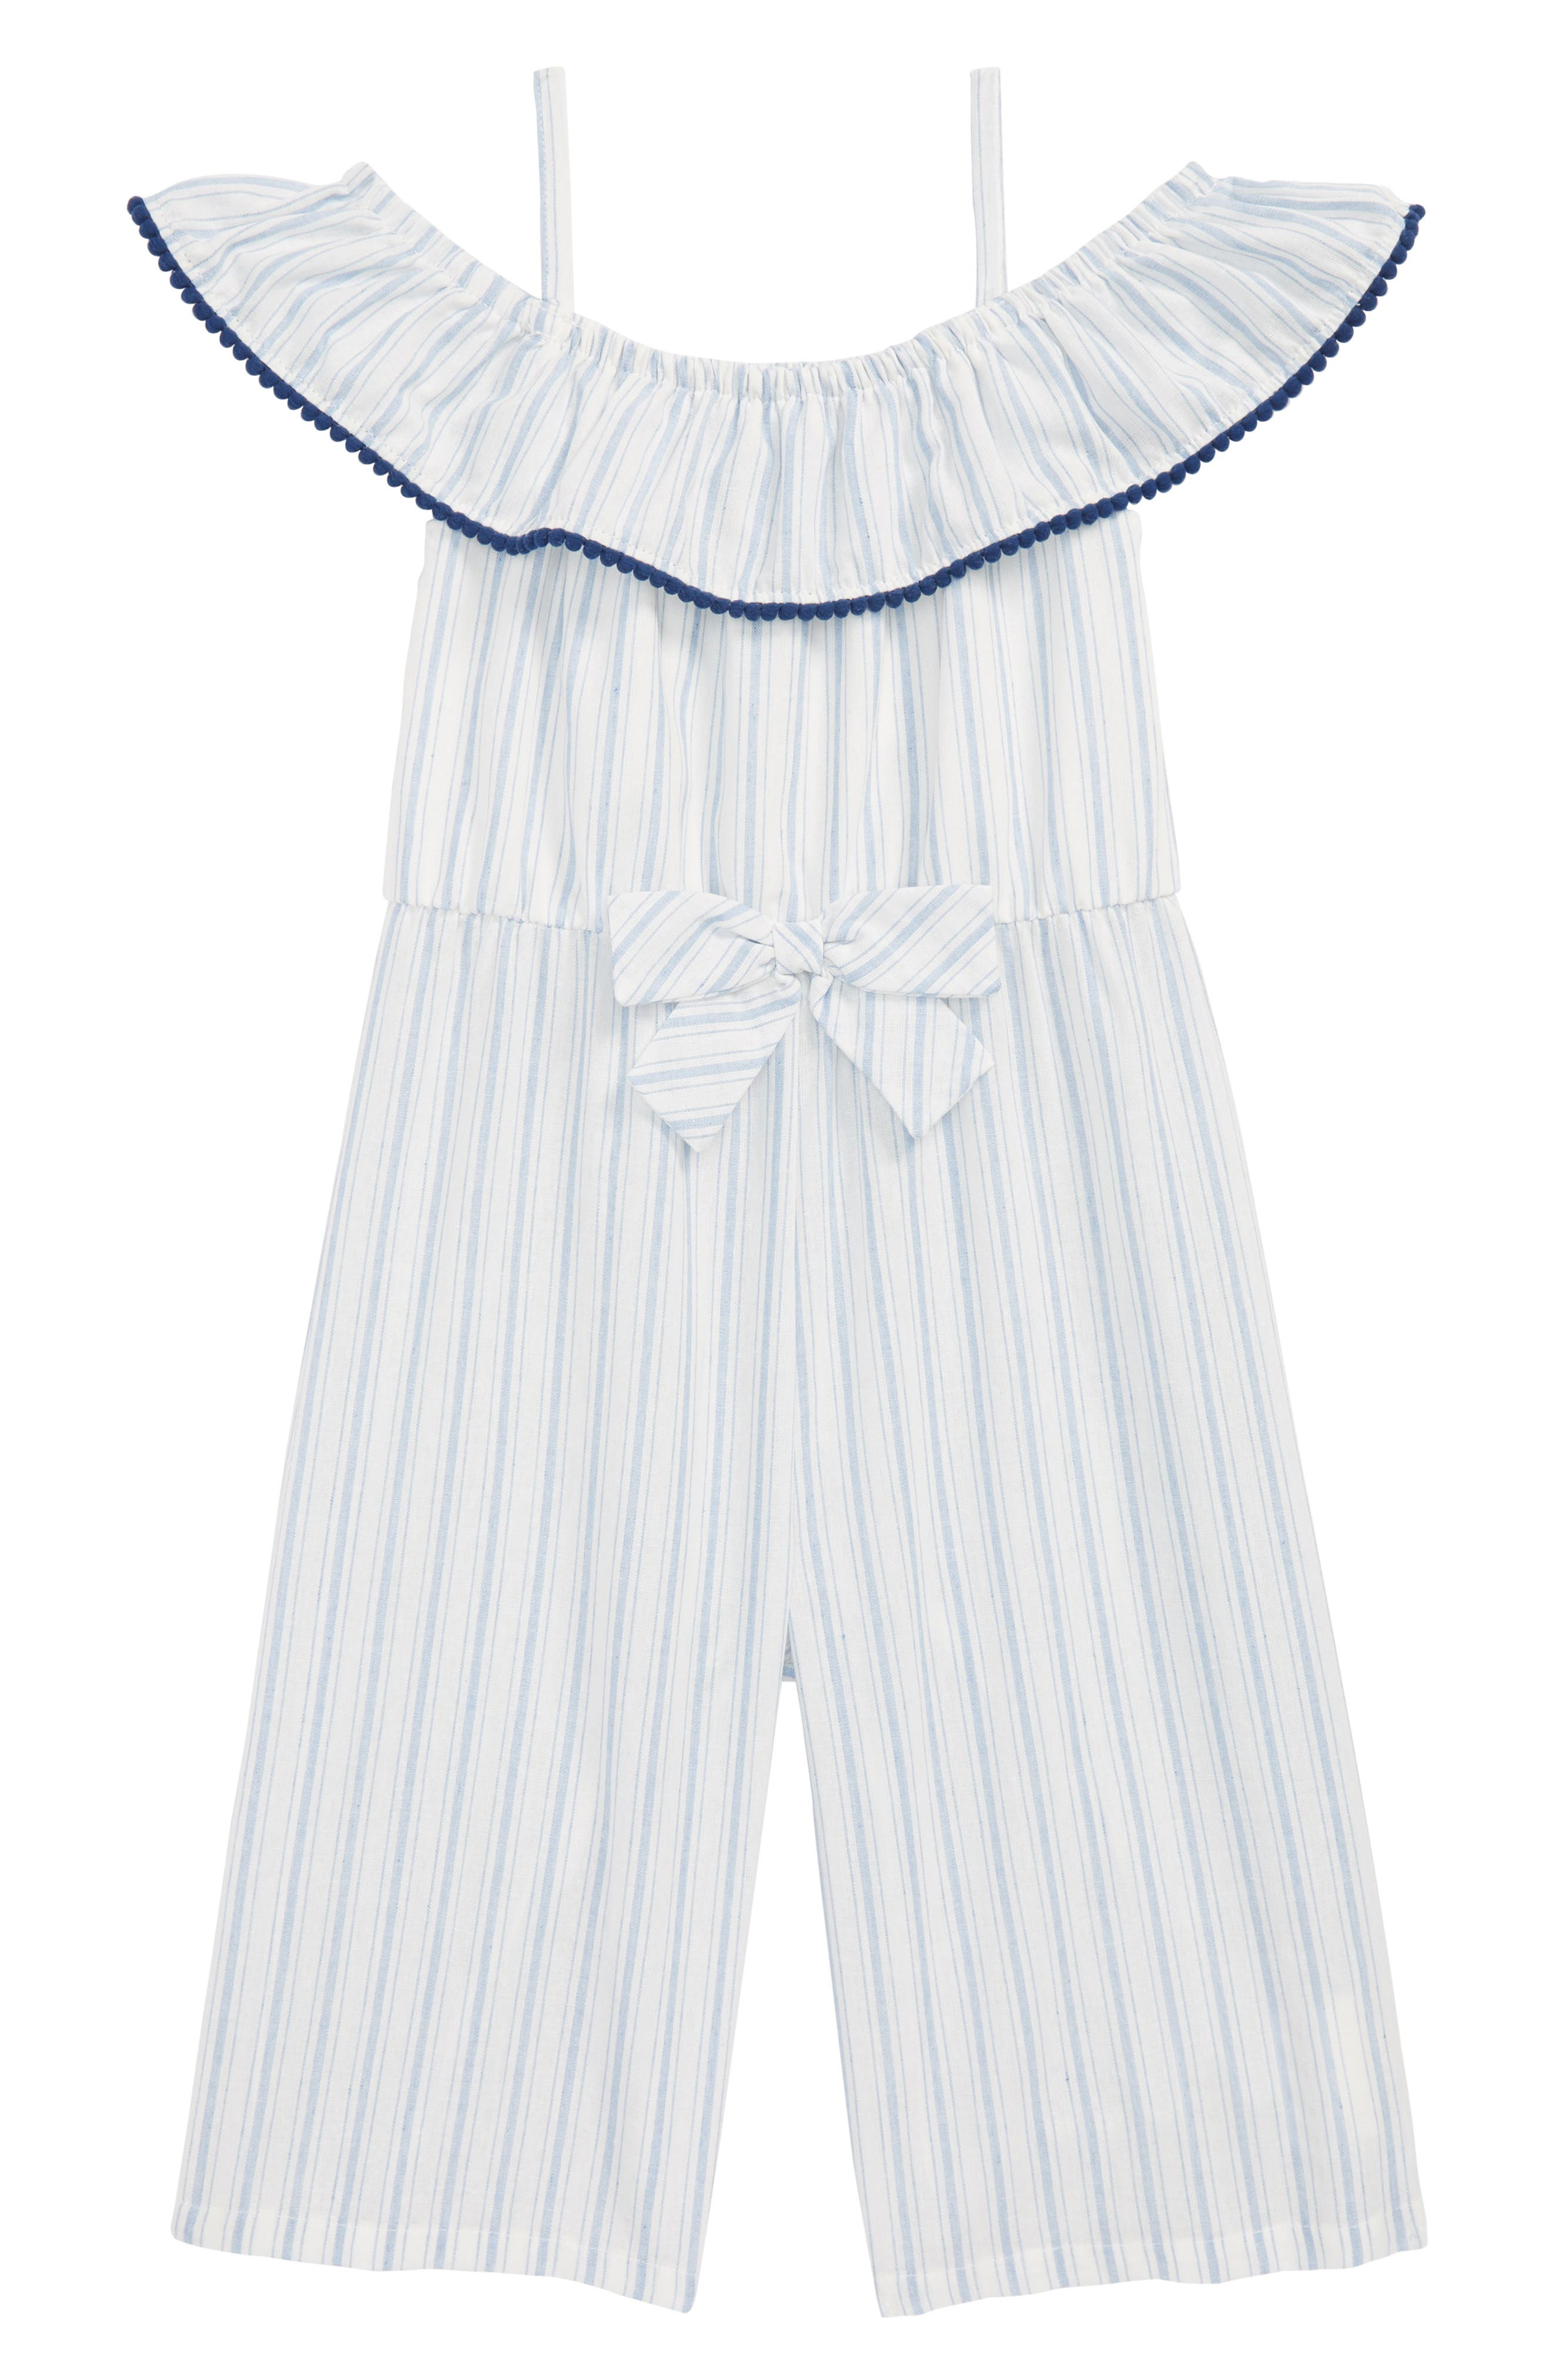 Pom Pom Striped Jumper,                         Main,                         color, Blue/ White